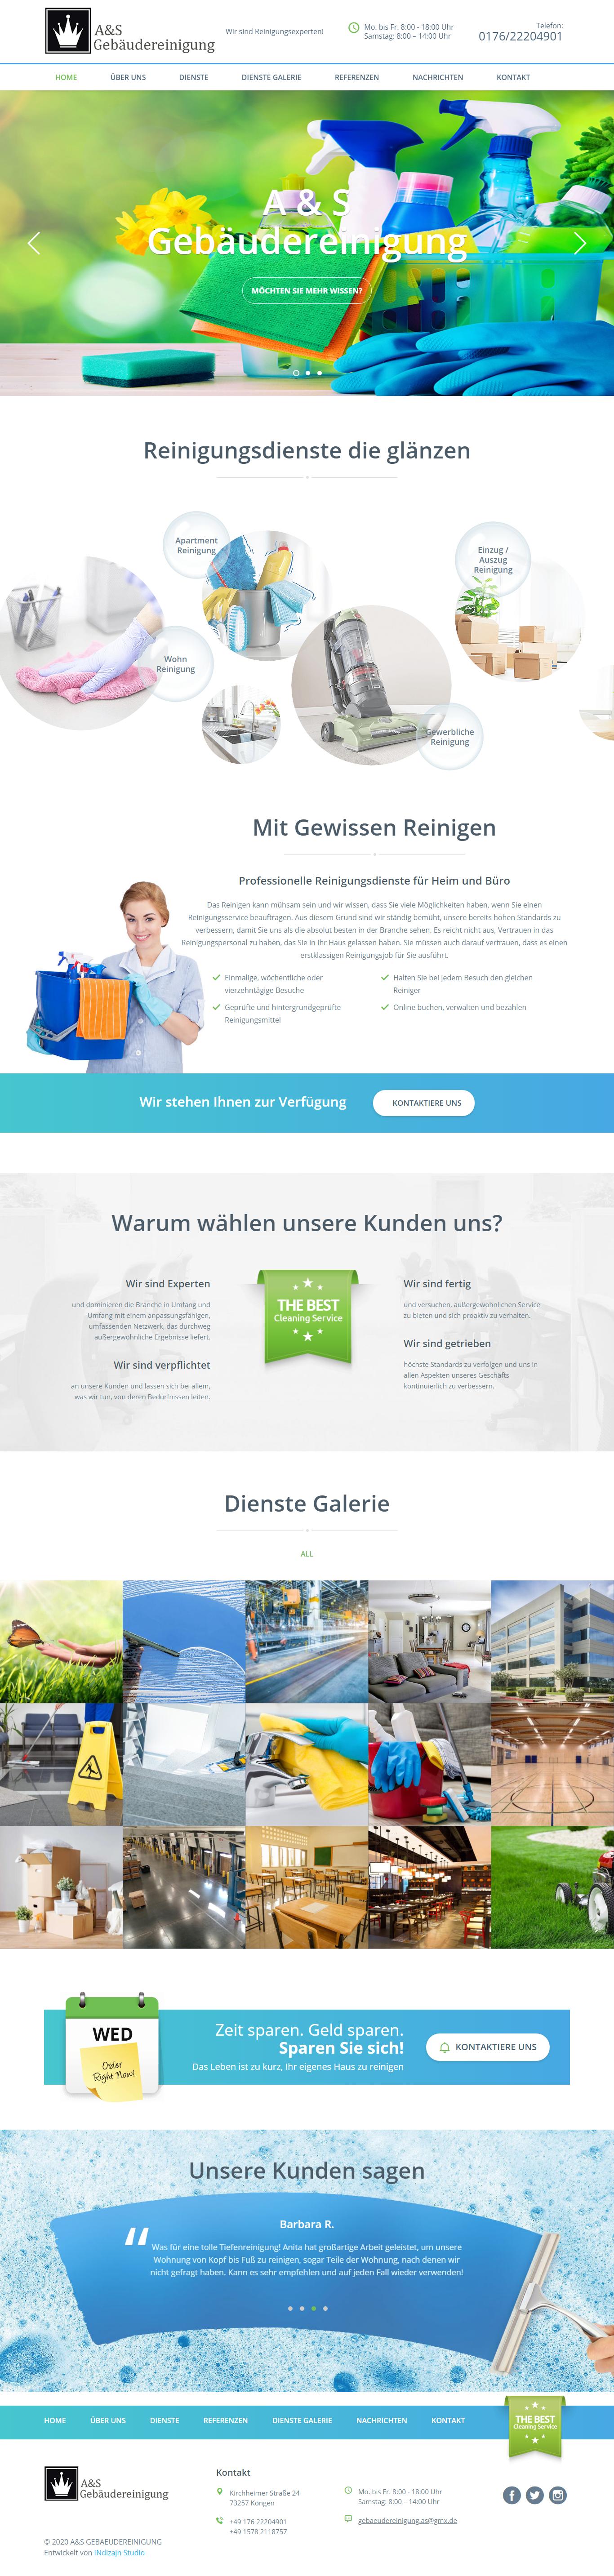 screencapture-a-sgebaeudereinigung-INdizajn-Studio-izrada-web-stranica-i-graficki-dizajn-FULL-SITE